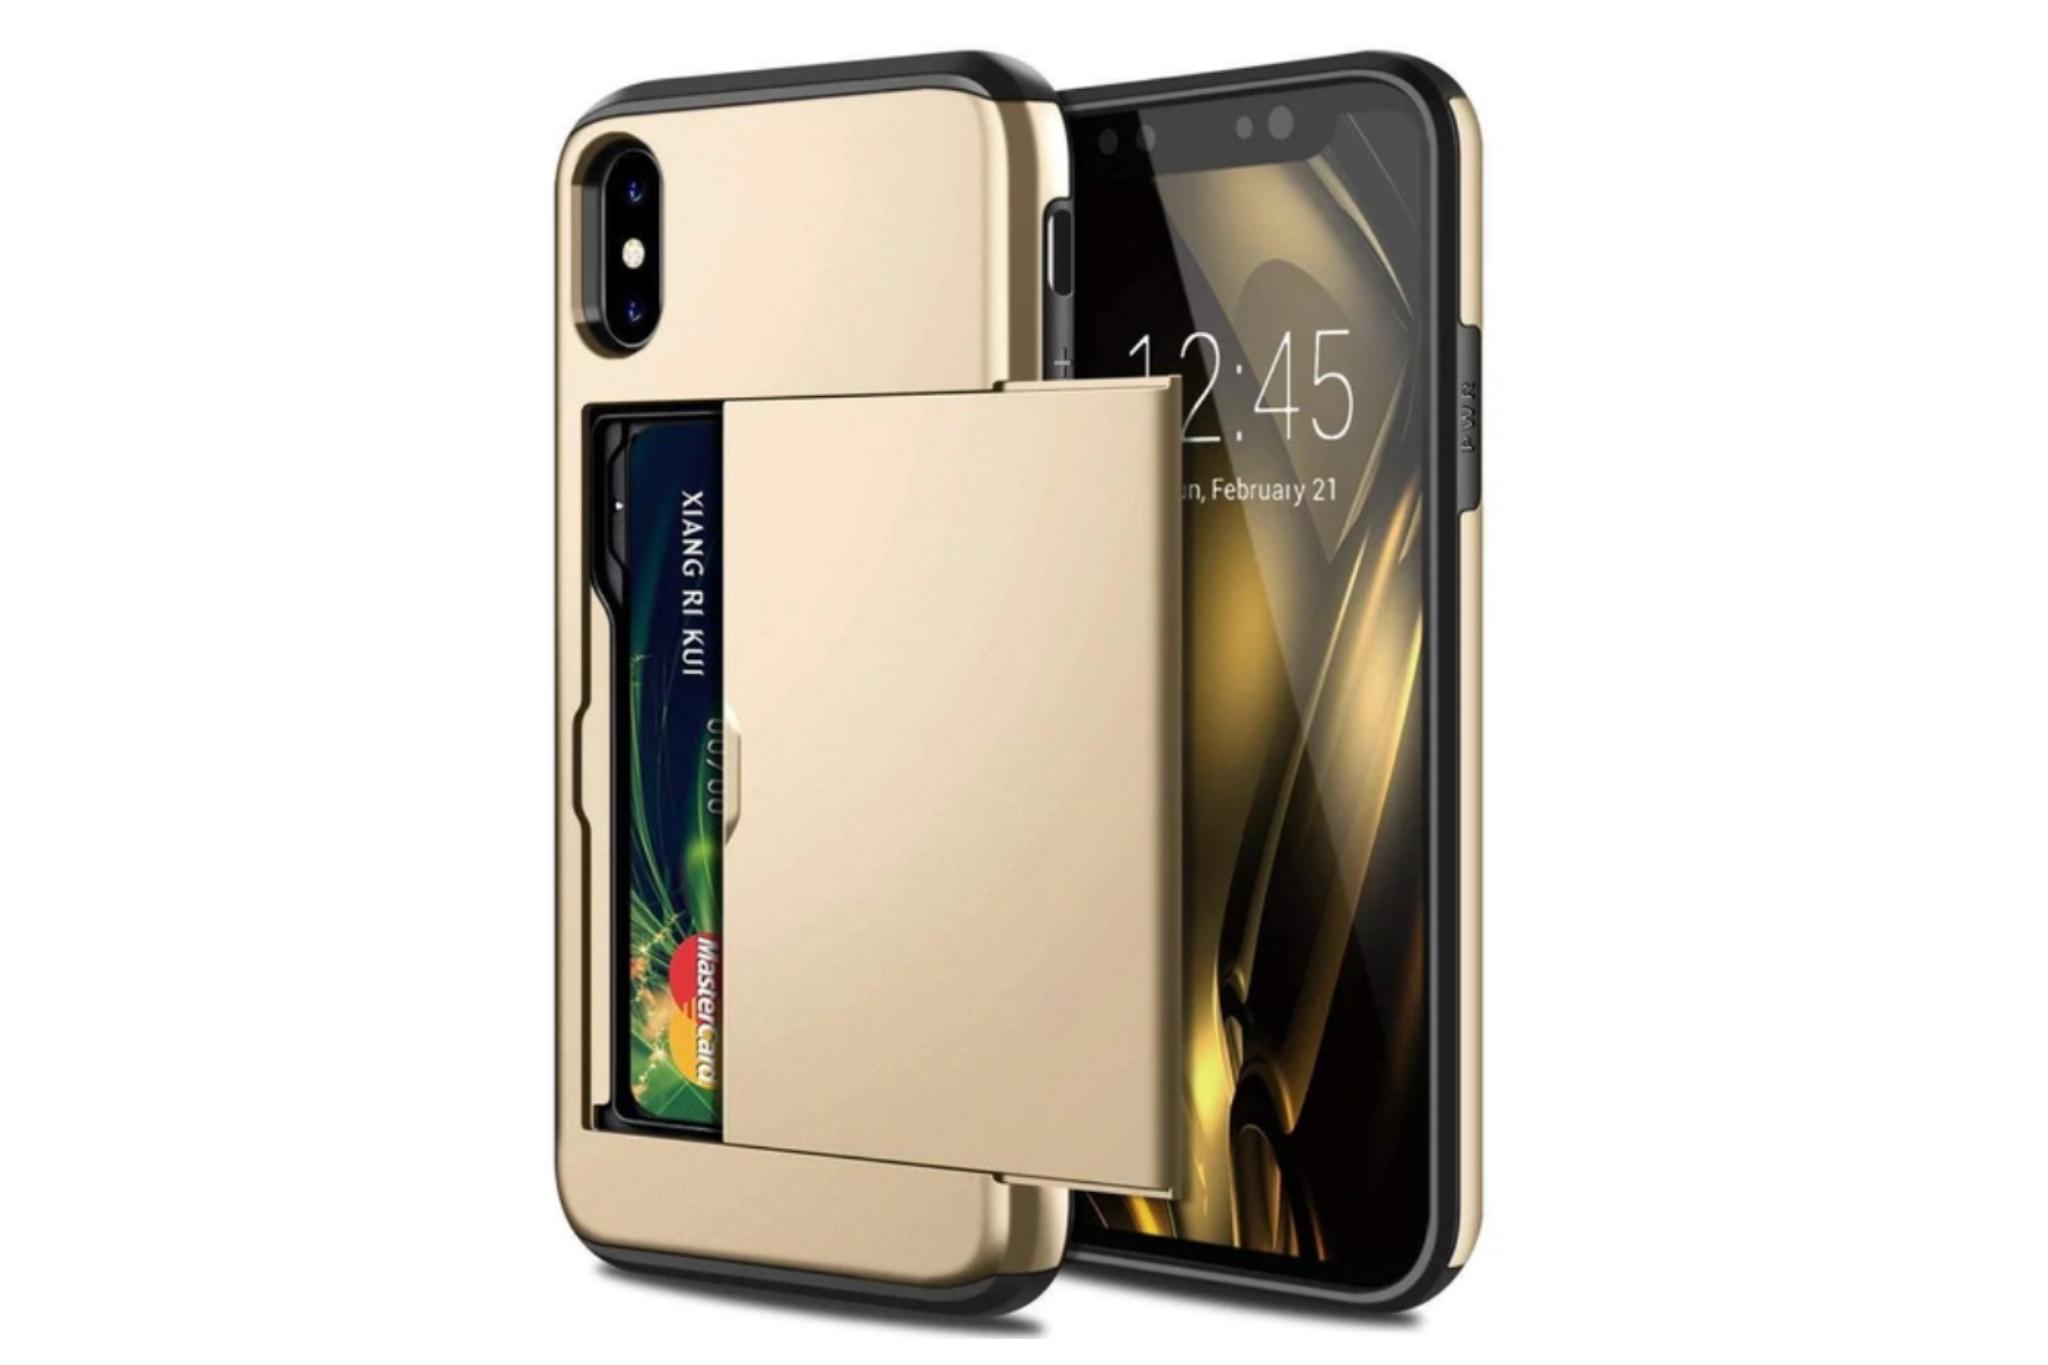 Smartphonehoesje iPhone 12 Mini | Pasjesschuif goud